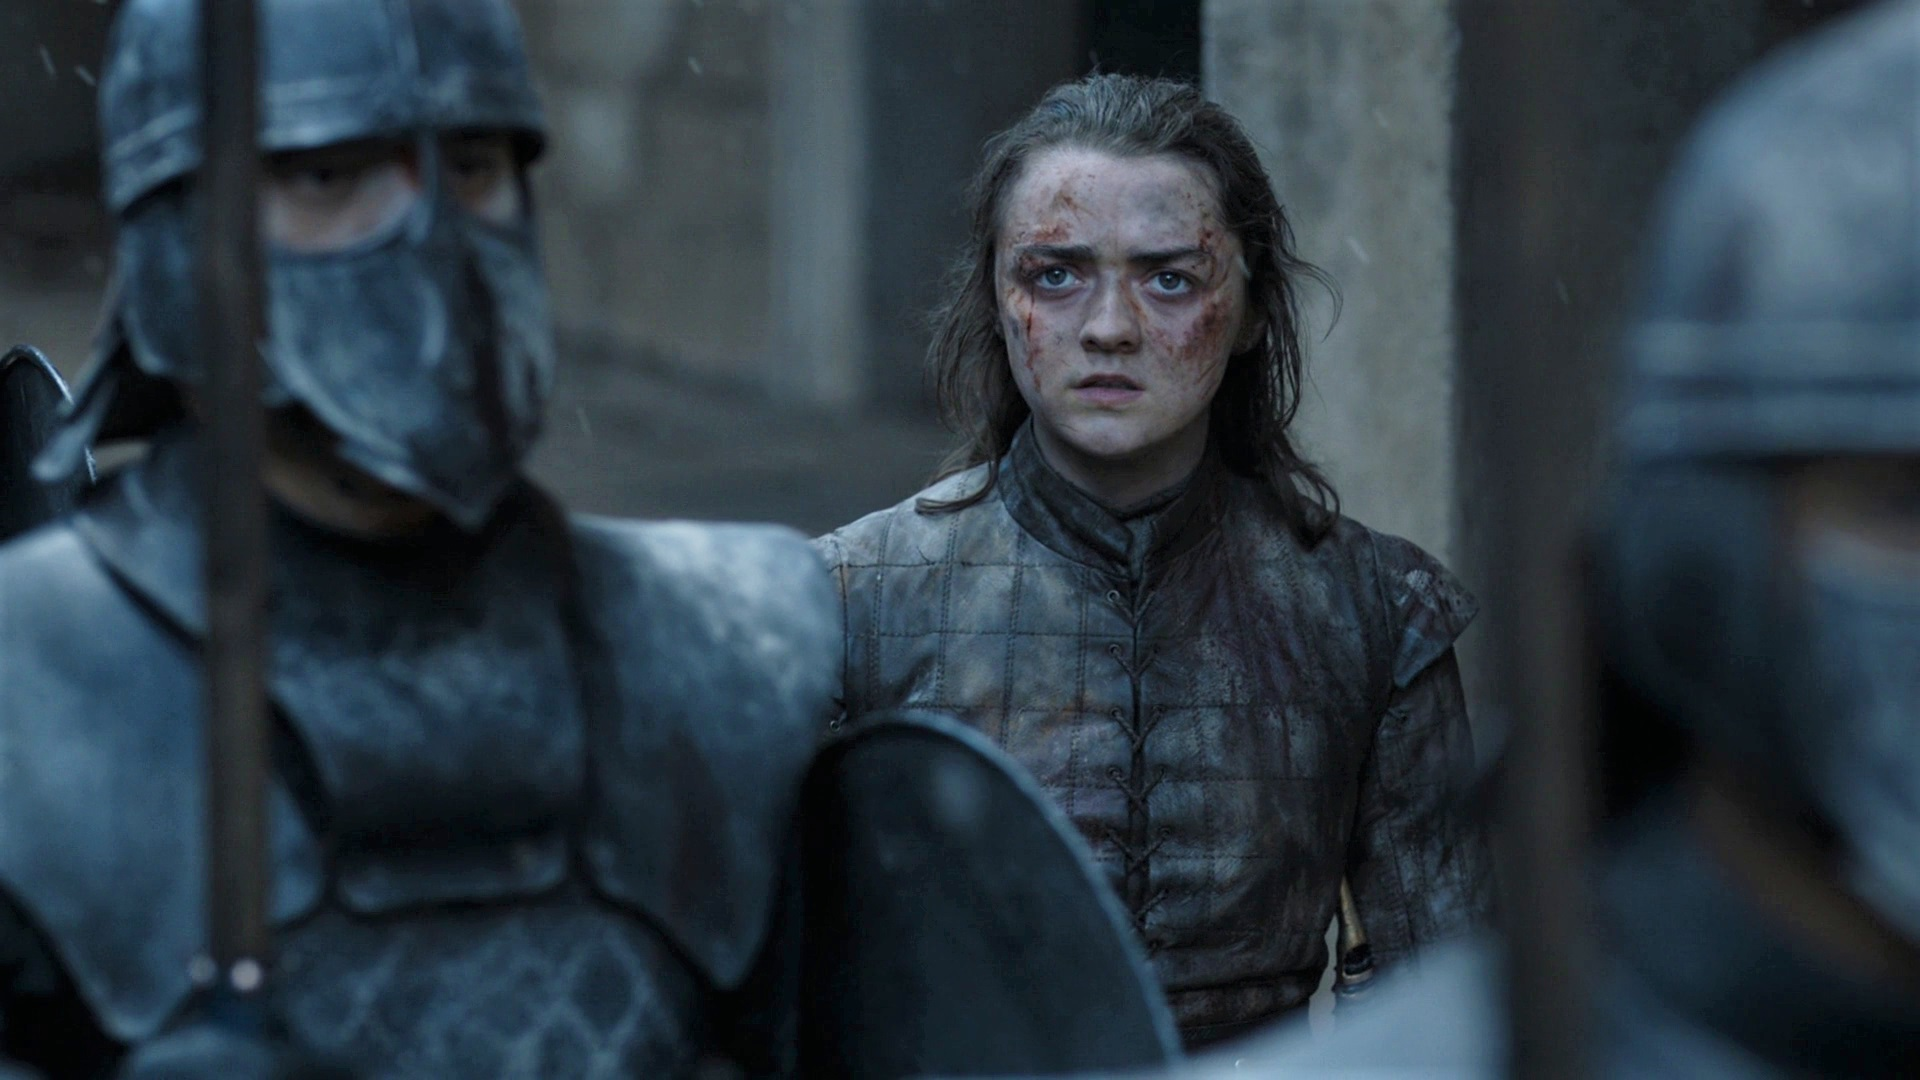 Arya-Stark-Unsullied-Kings-Landing-Season-8-806.jpg